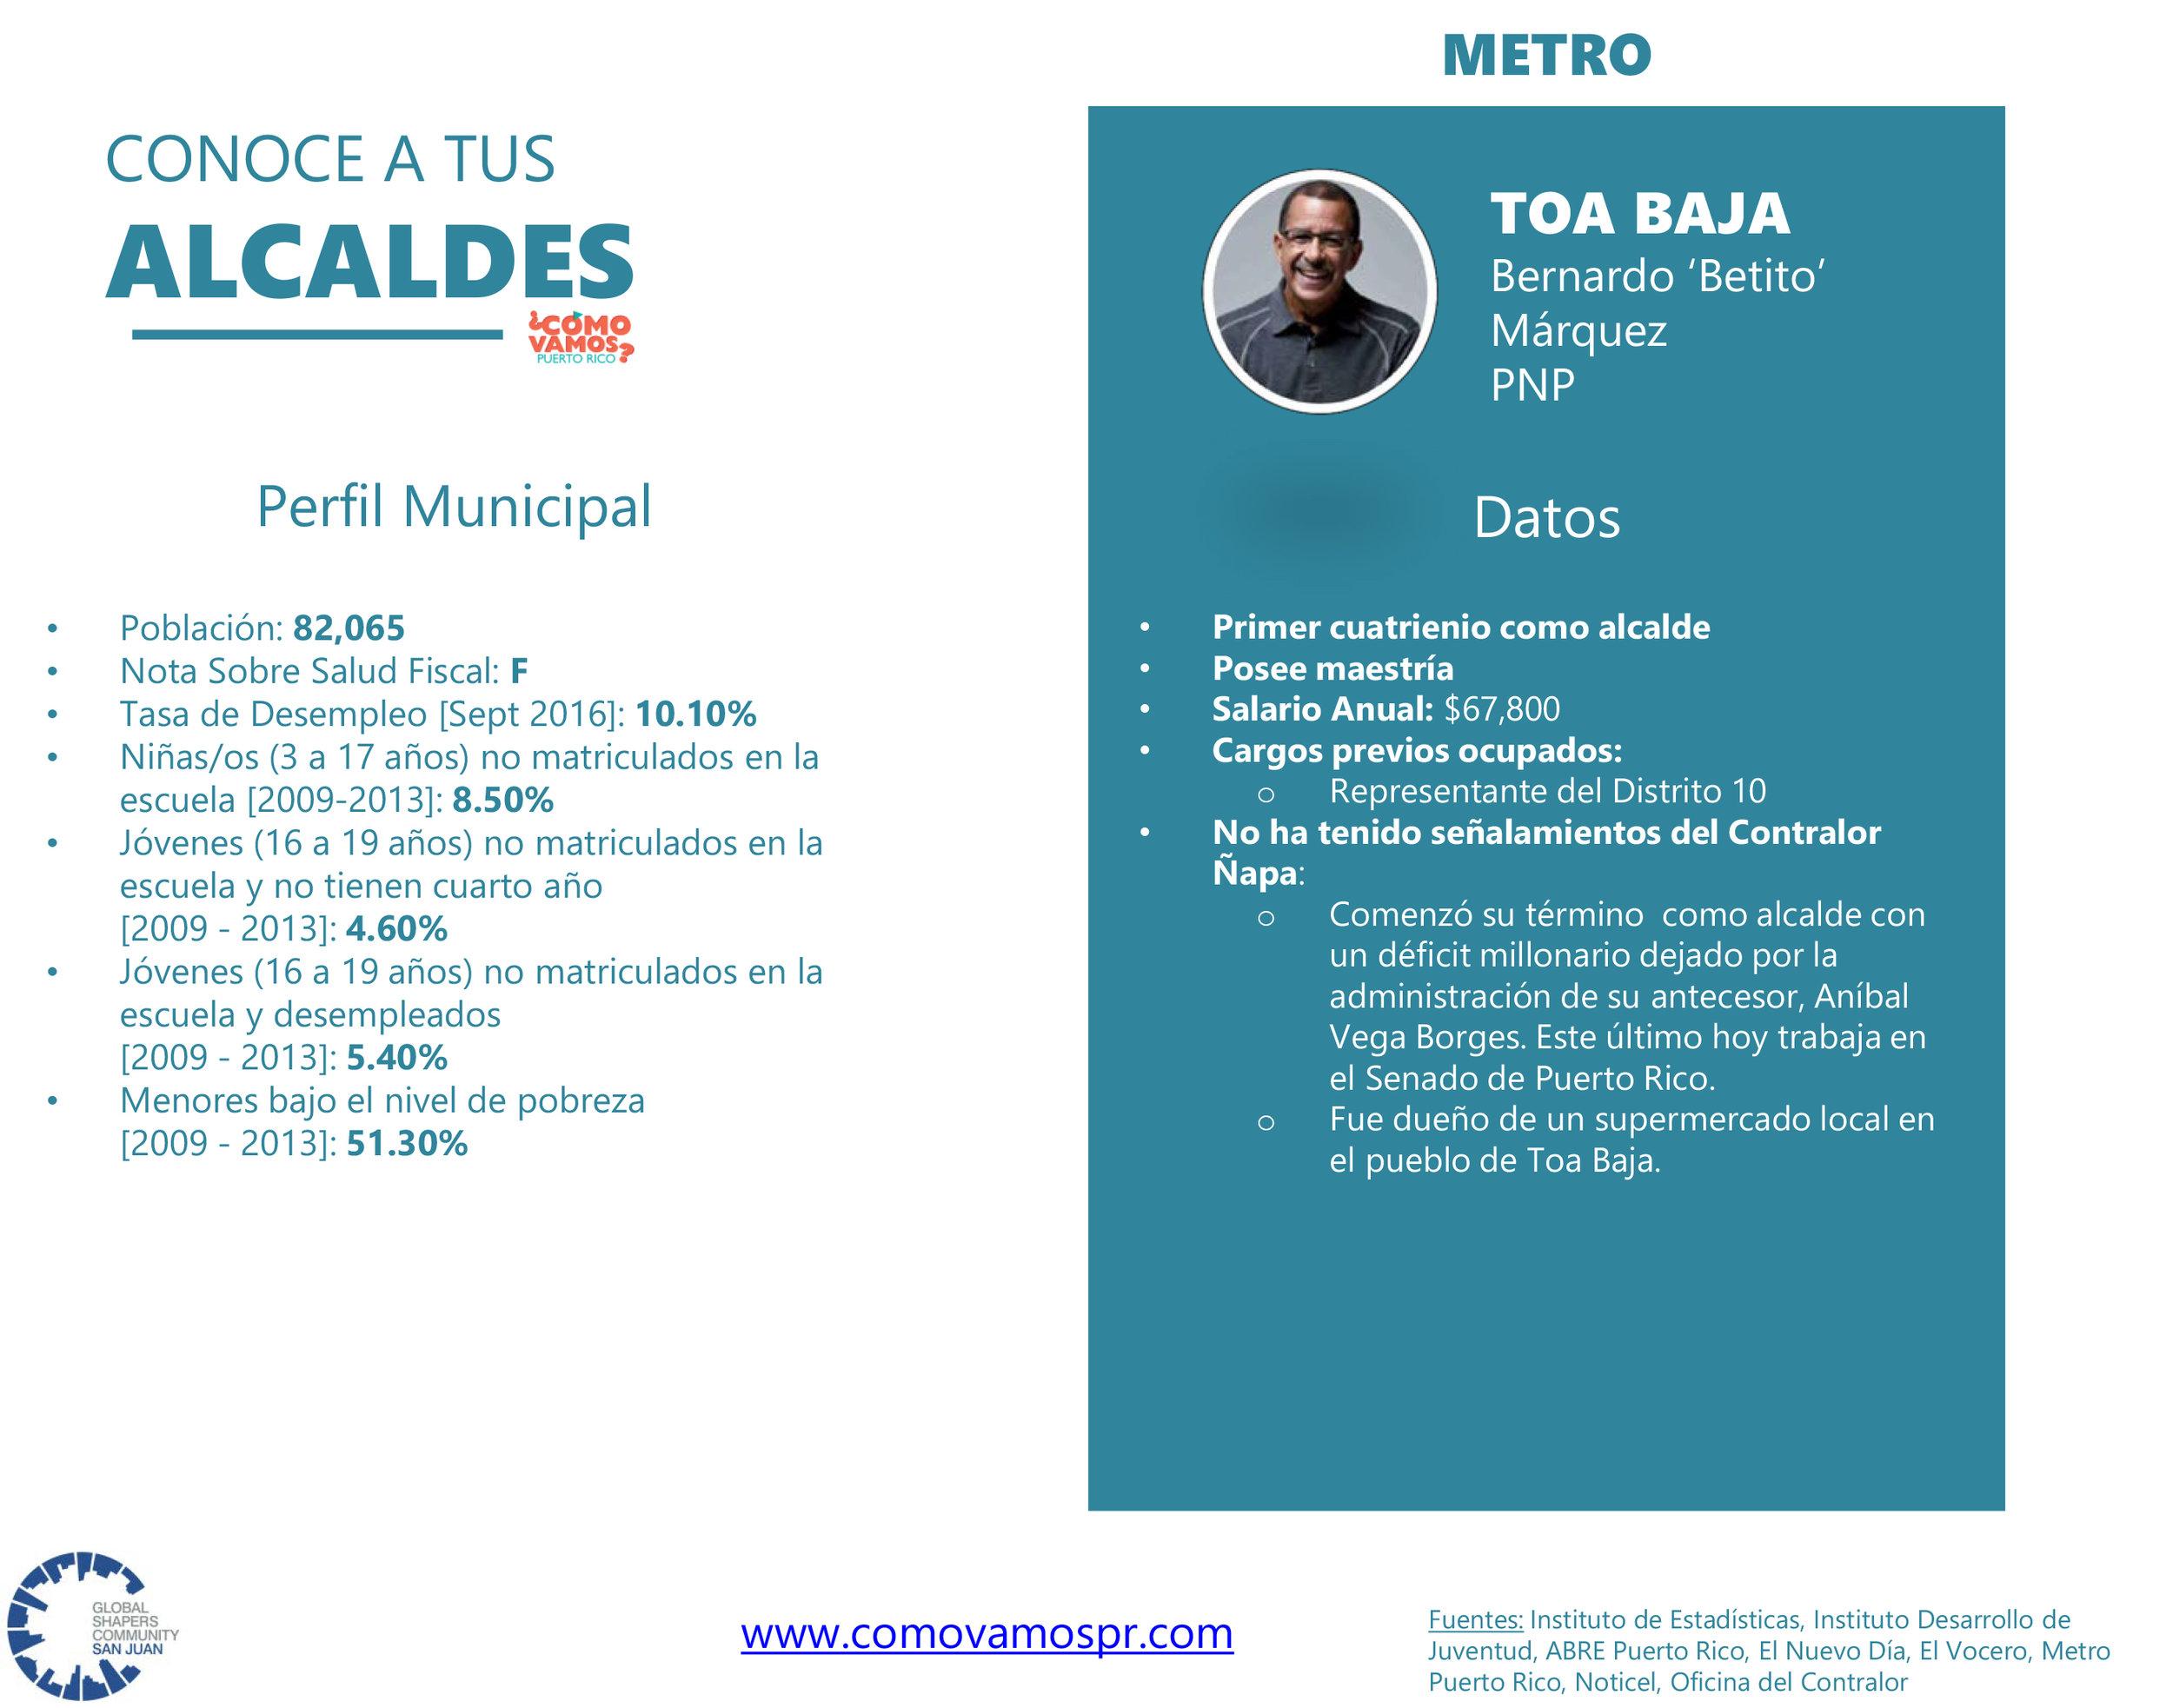 Alcaldes_Metro_ToaBaja.jpg